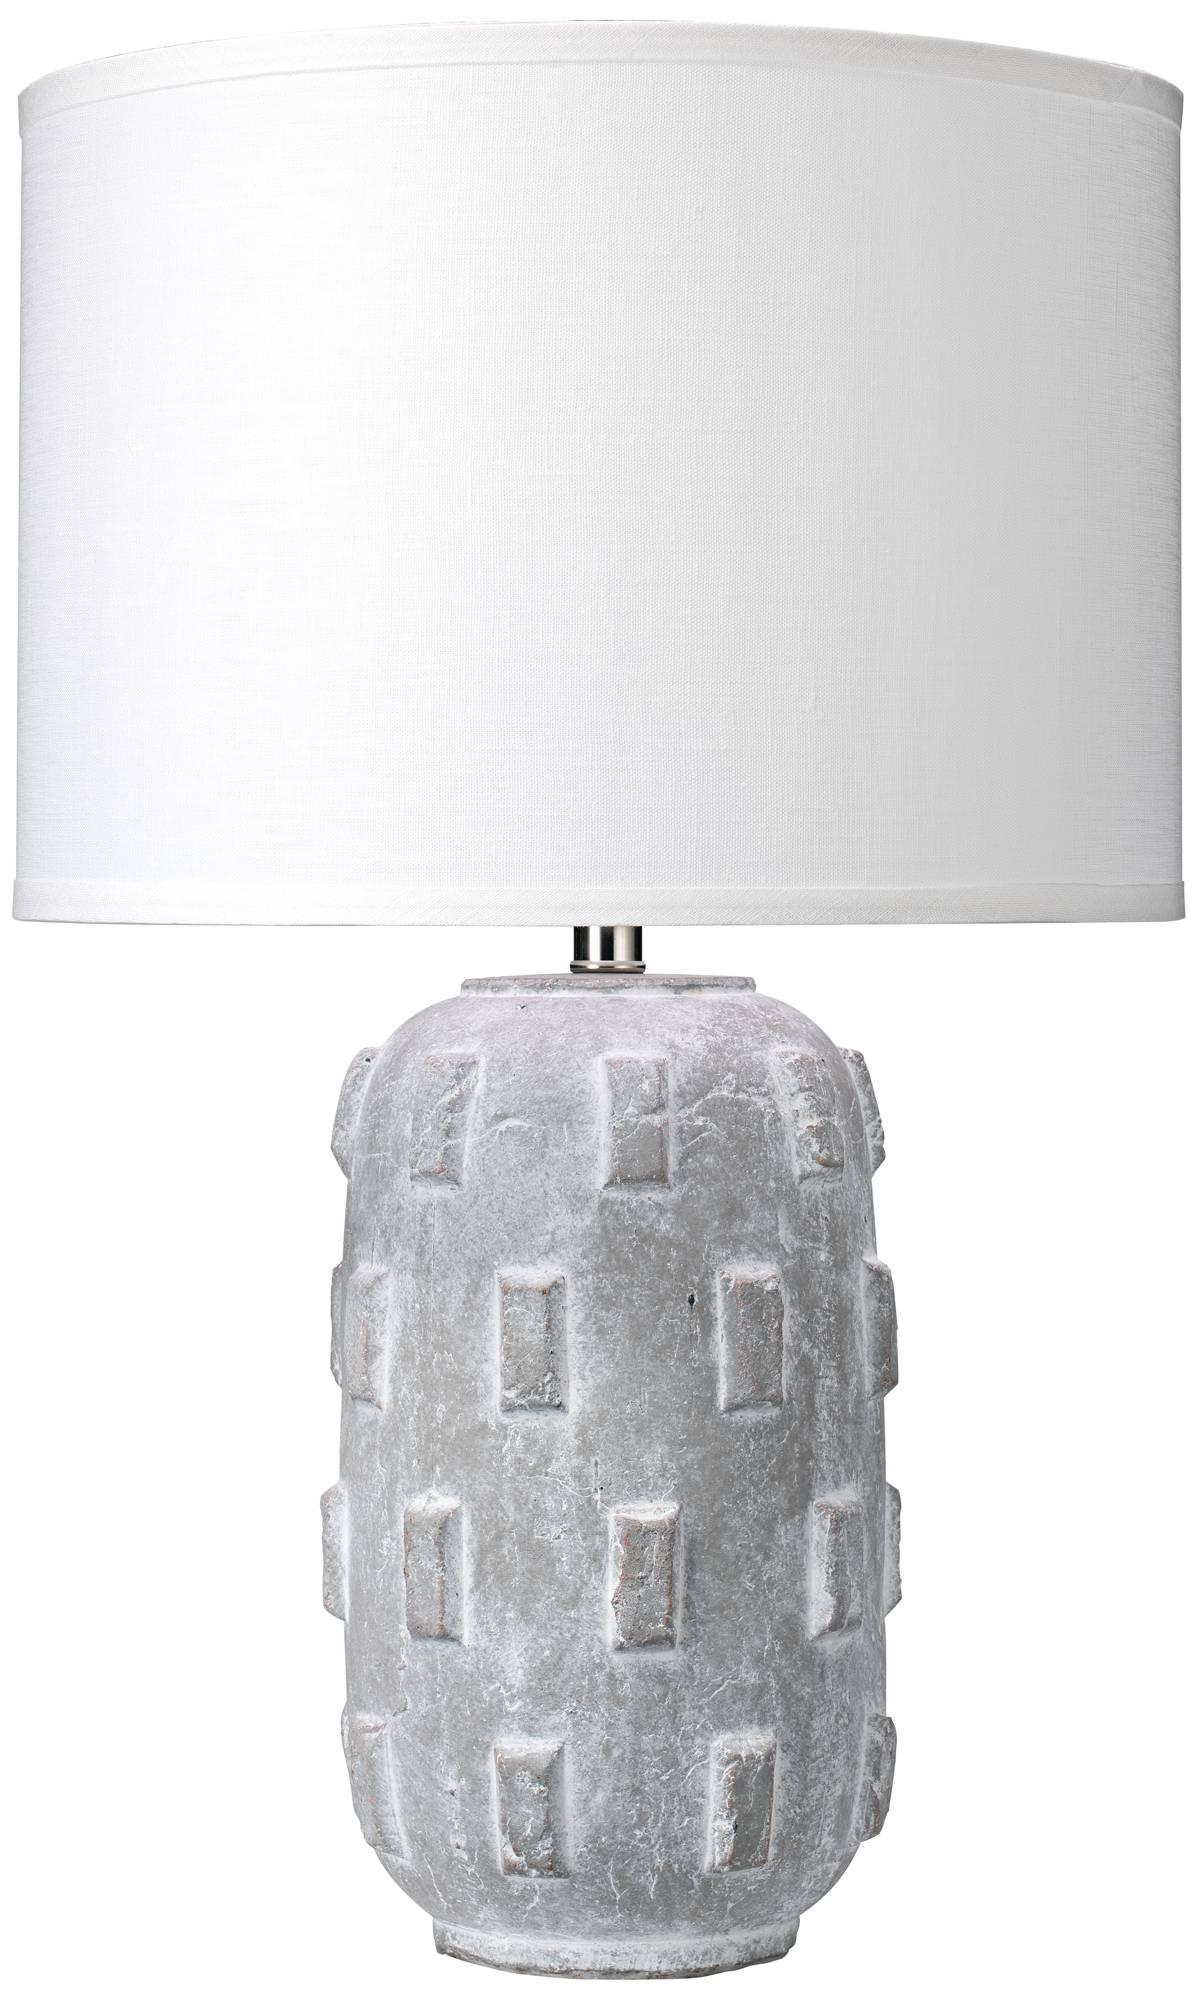 Jamie young boulder gray concrete capsule ceramic table lamp